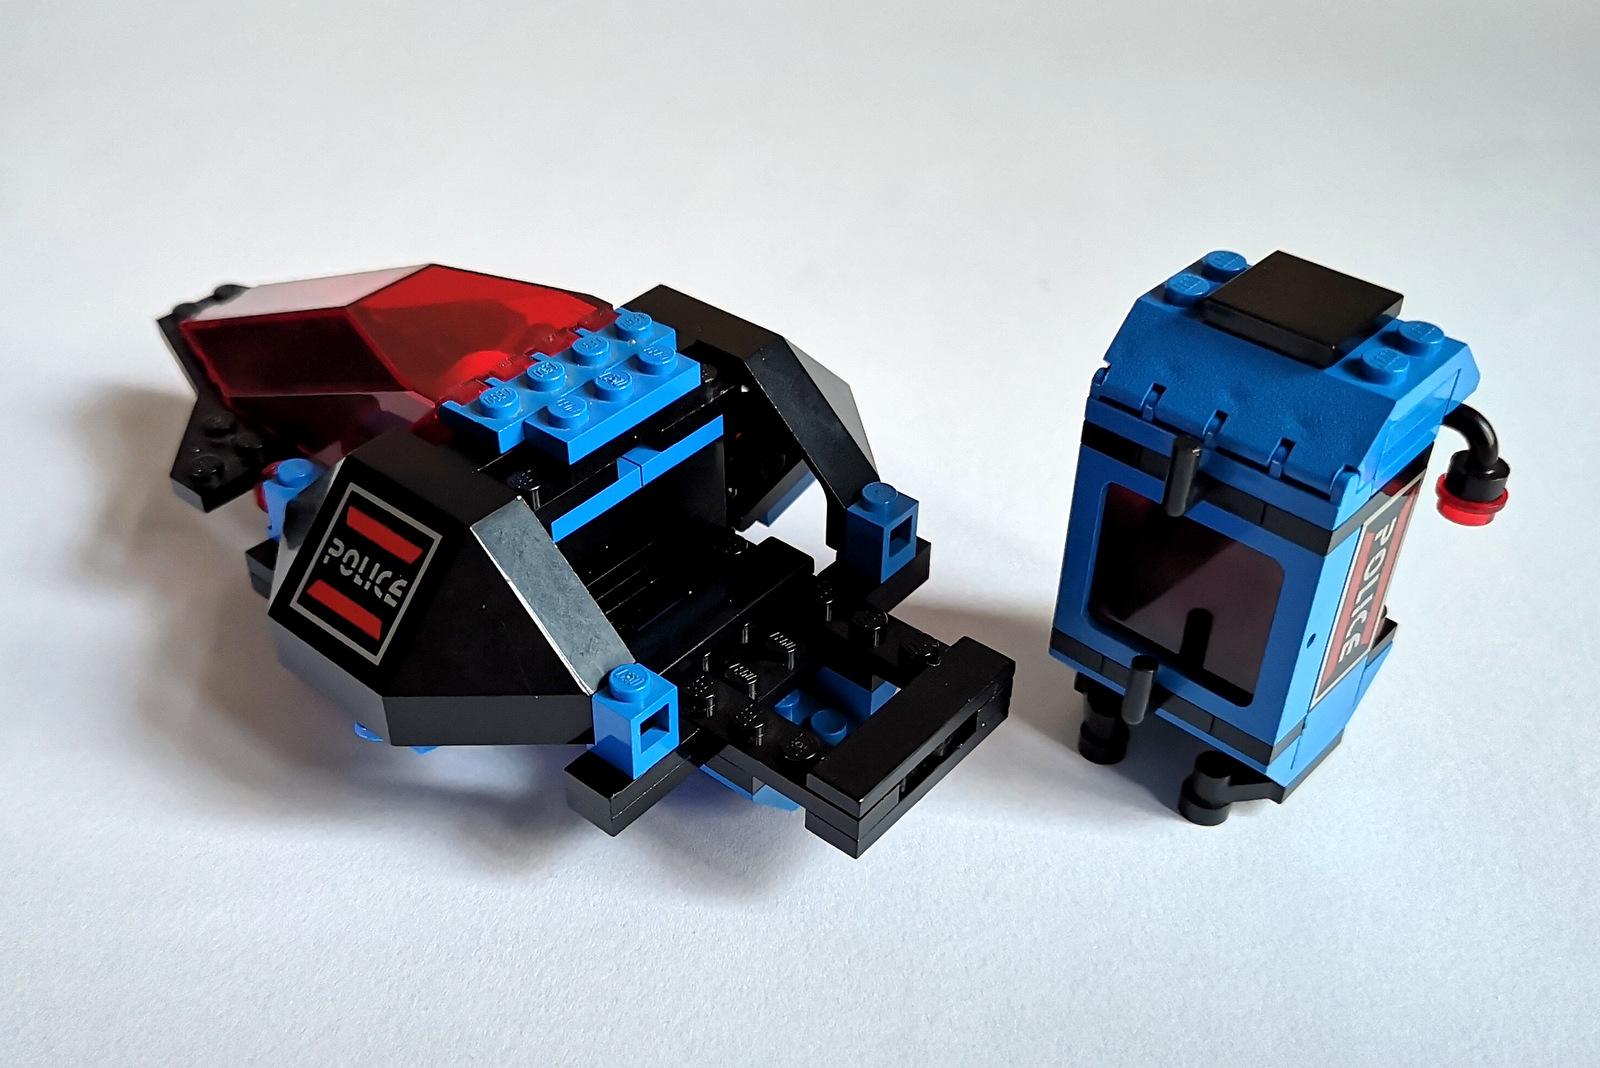 6886 LEGO Space Police Gefängnis